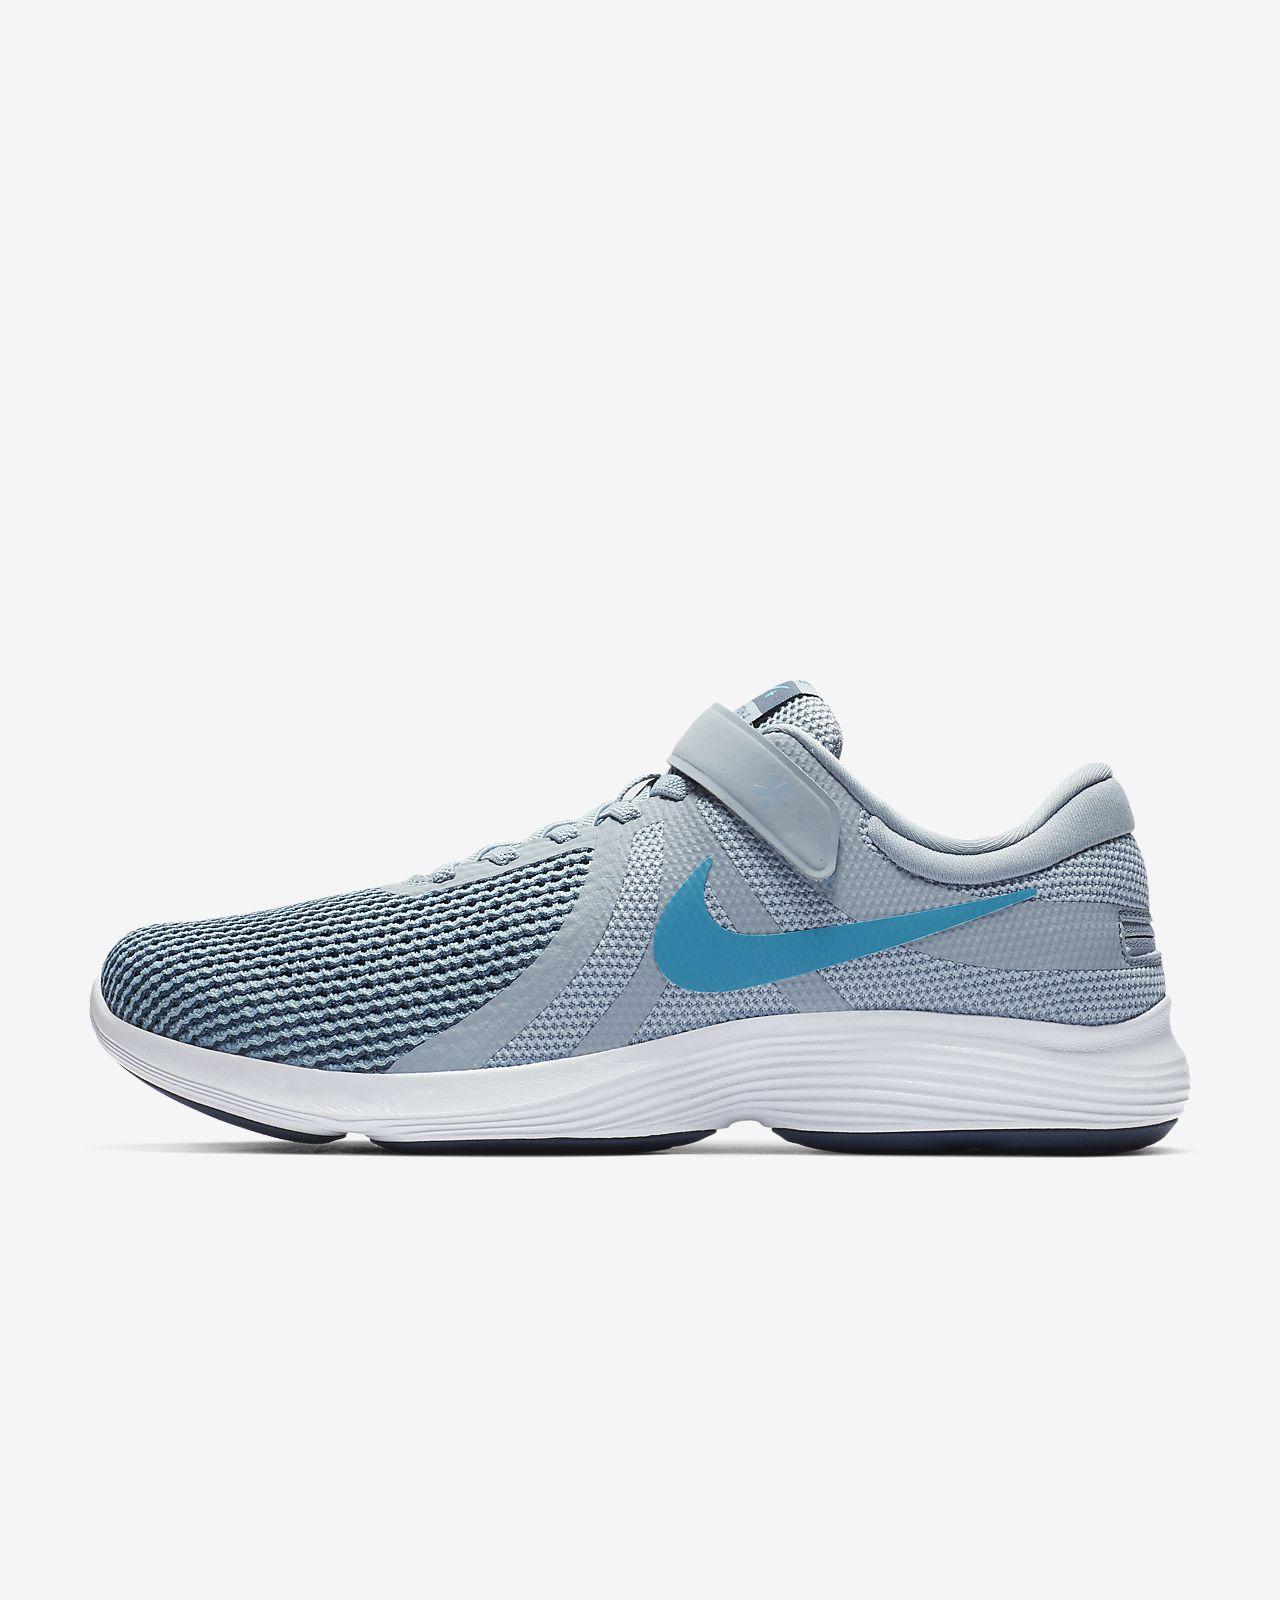 new product 179f3 a3d9b ... Nike Revolution 4 FlyEase (Ekstra Geniş) Erkek Koşu Ayakkabısı